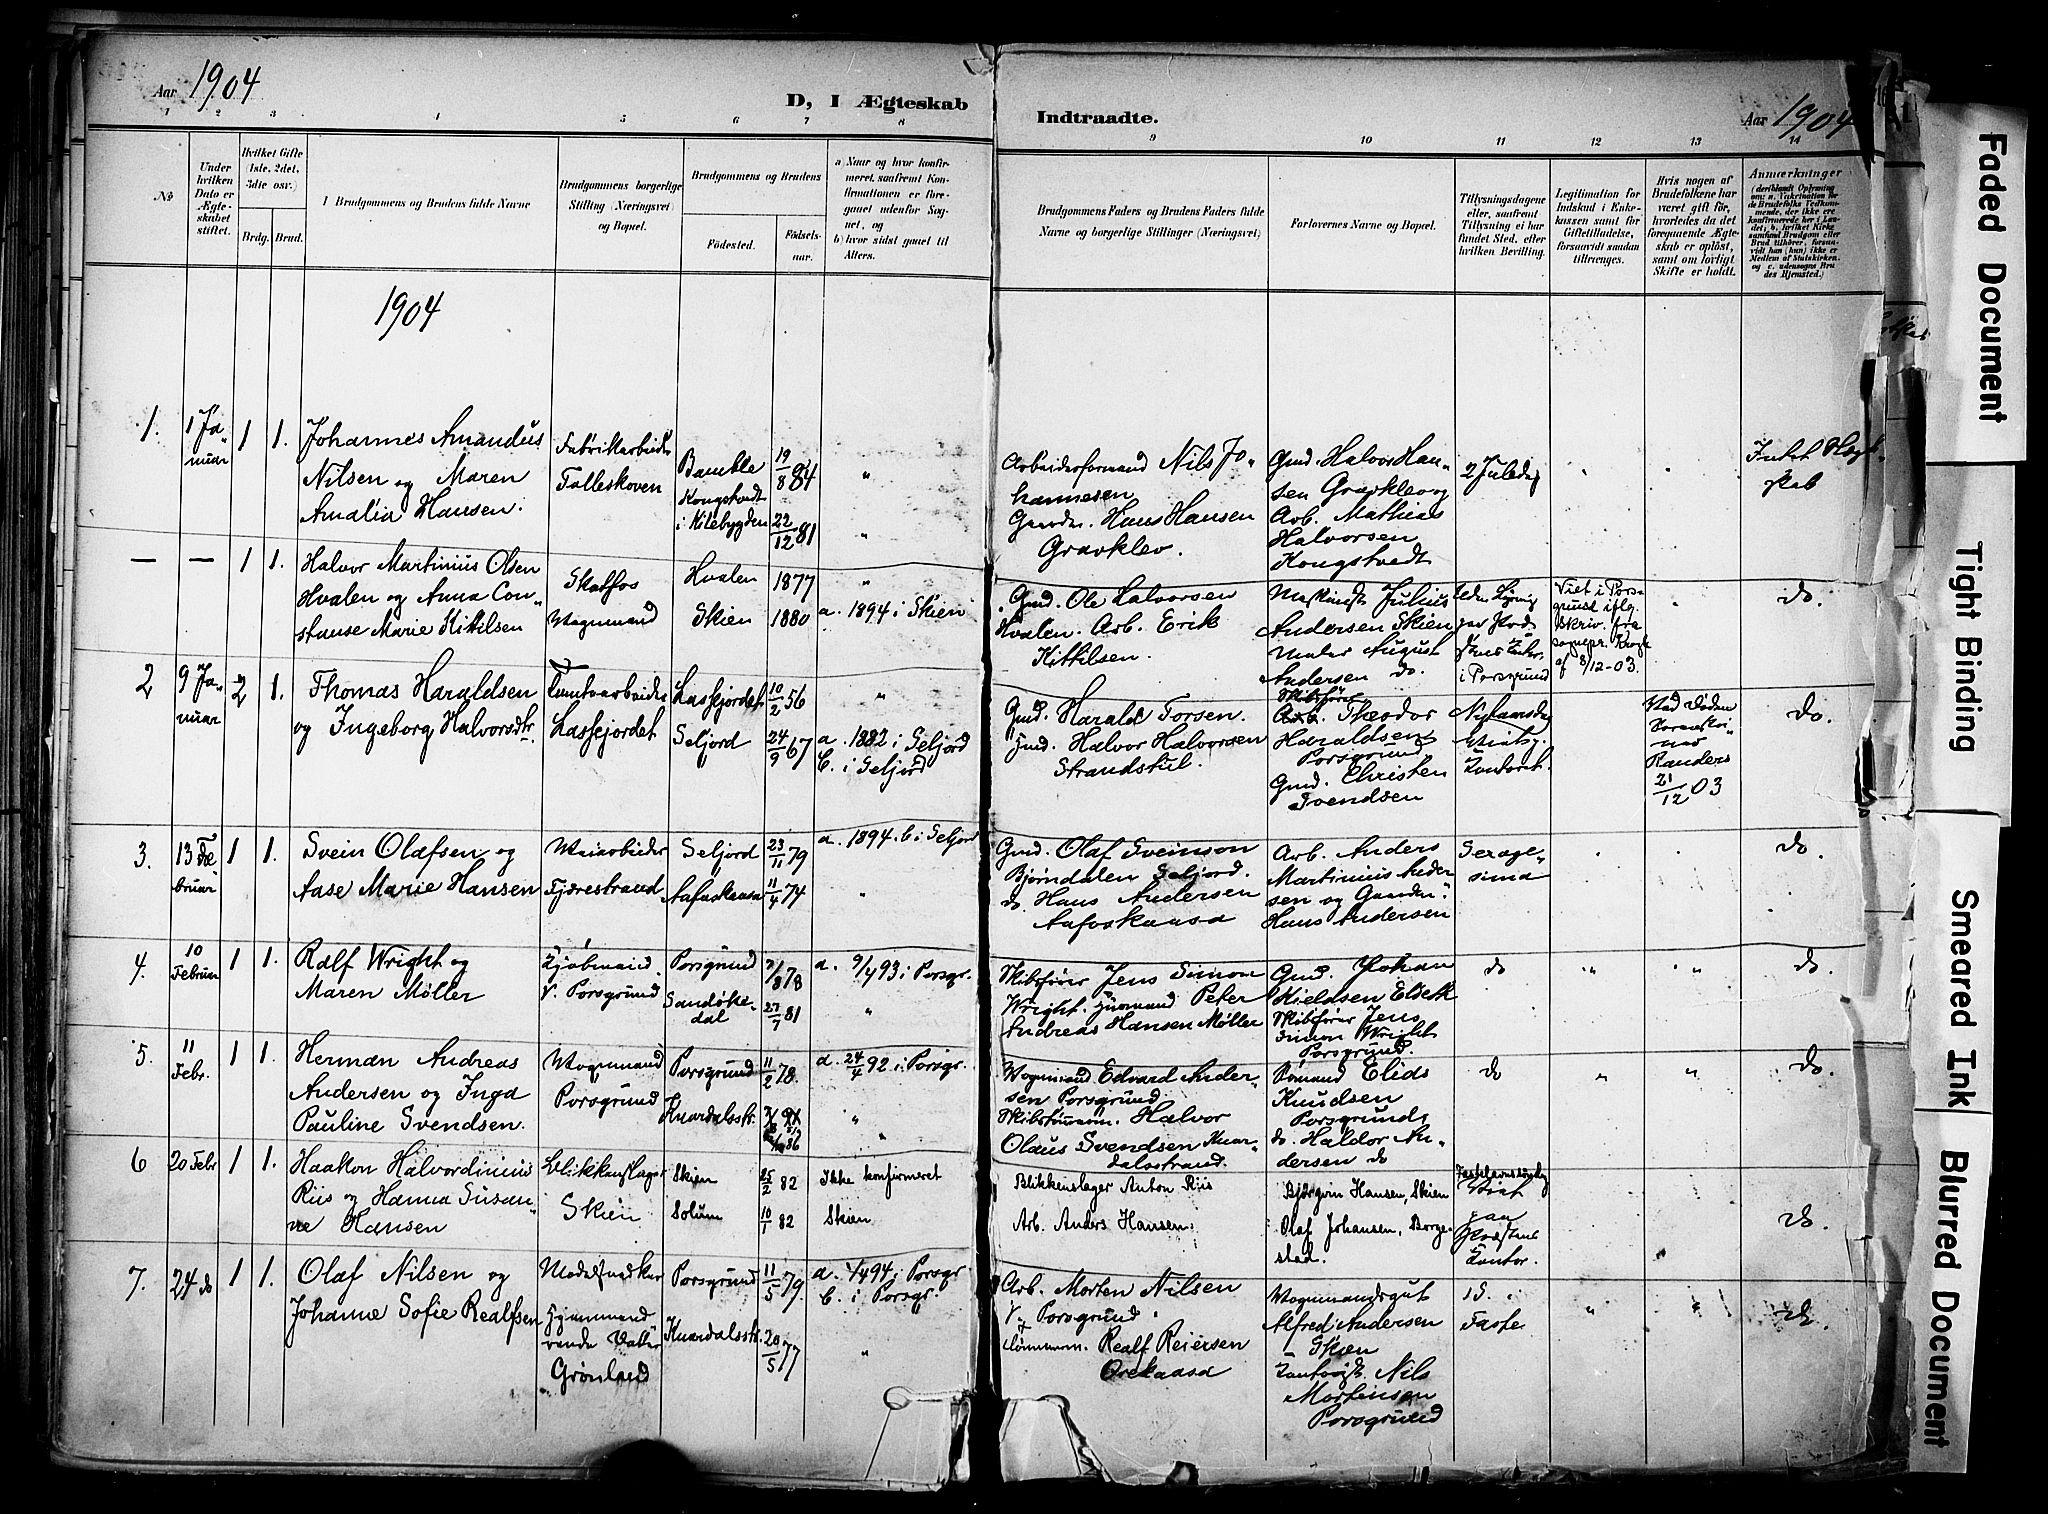 SAKO, Solum kirkebøker, F/Fa/L0011: Ministerialbok nr. I 11, 1898-1909, s. 216